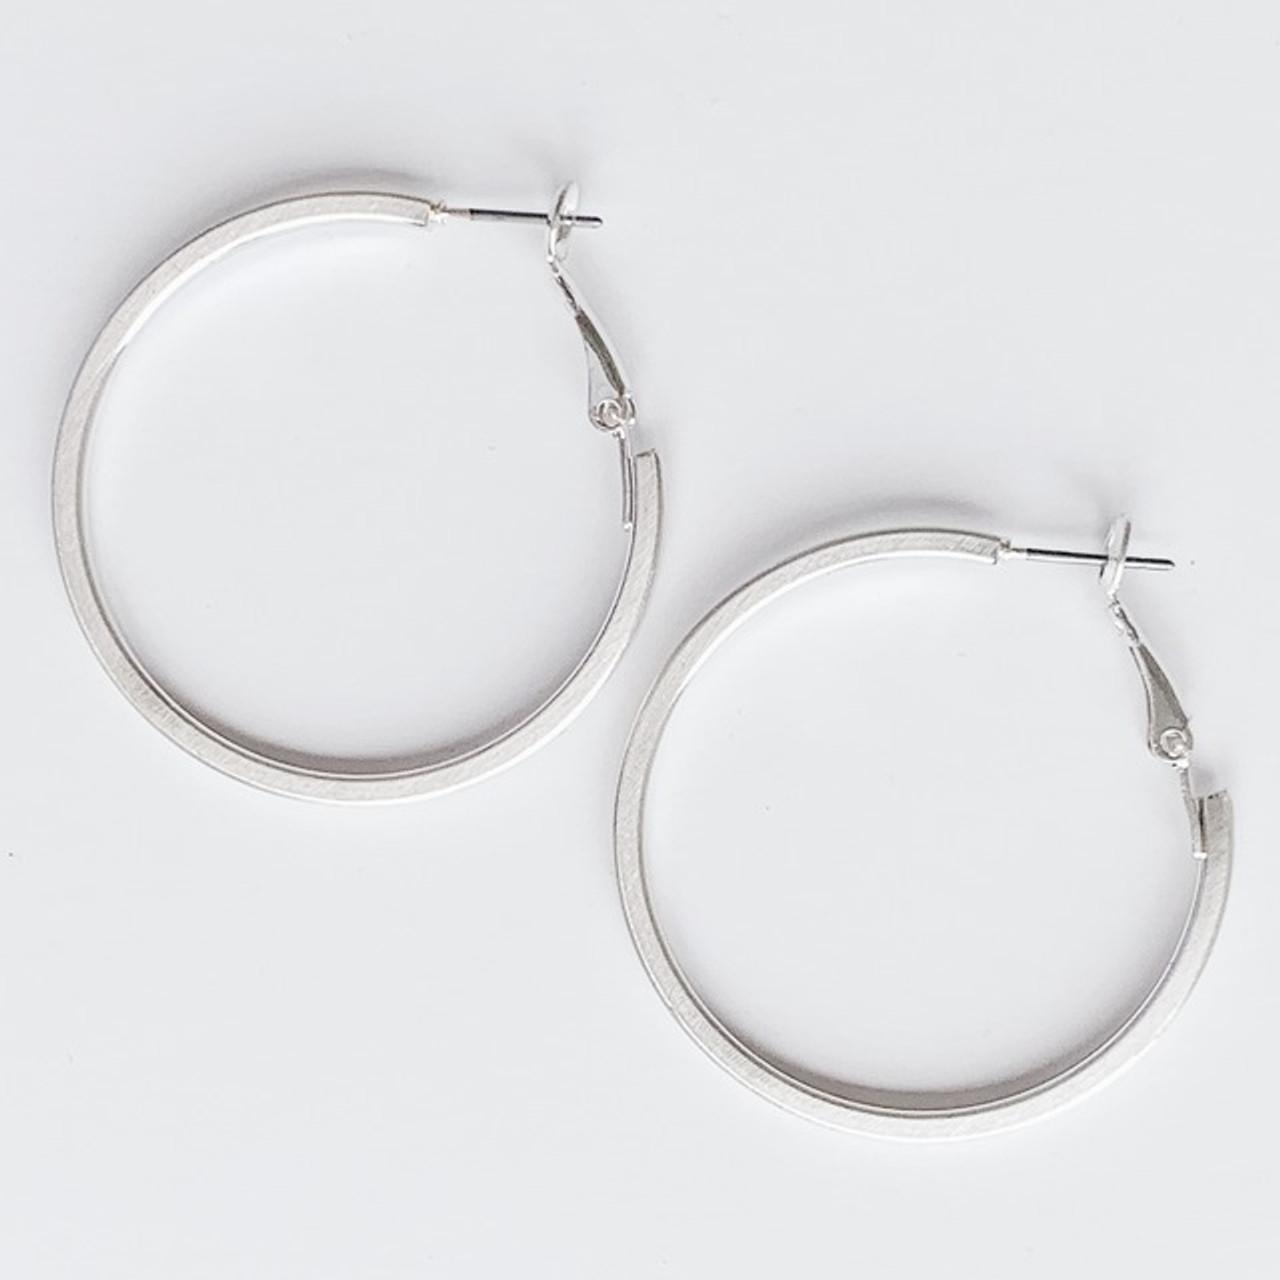 Your everyday silver hoop earrings, Nickel and lead free.